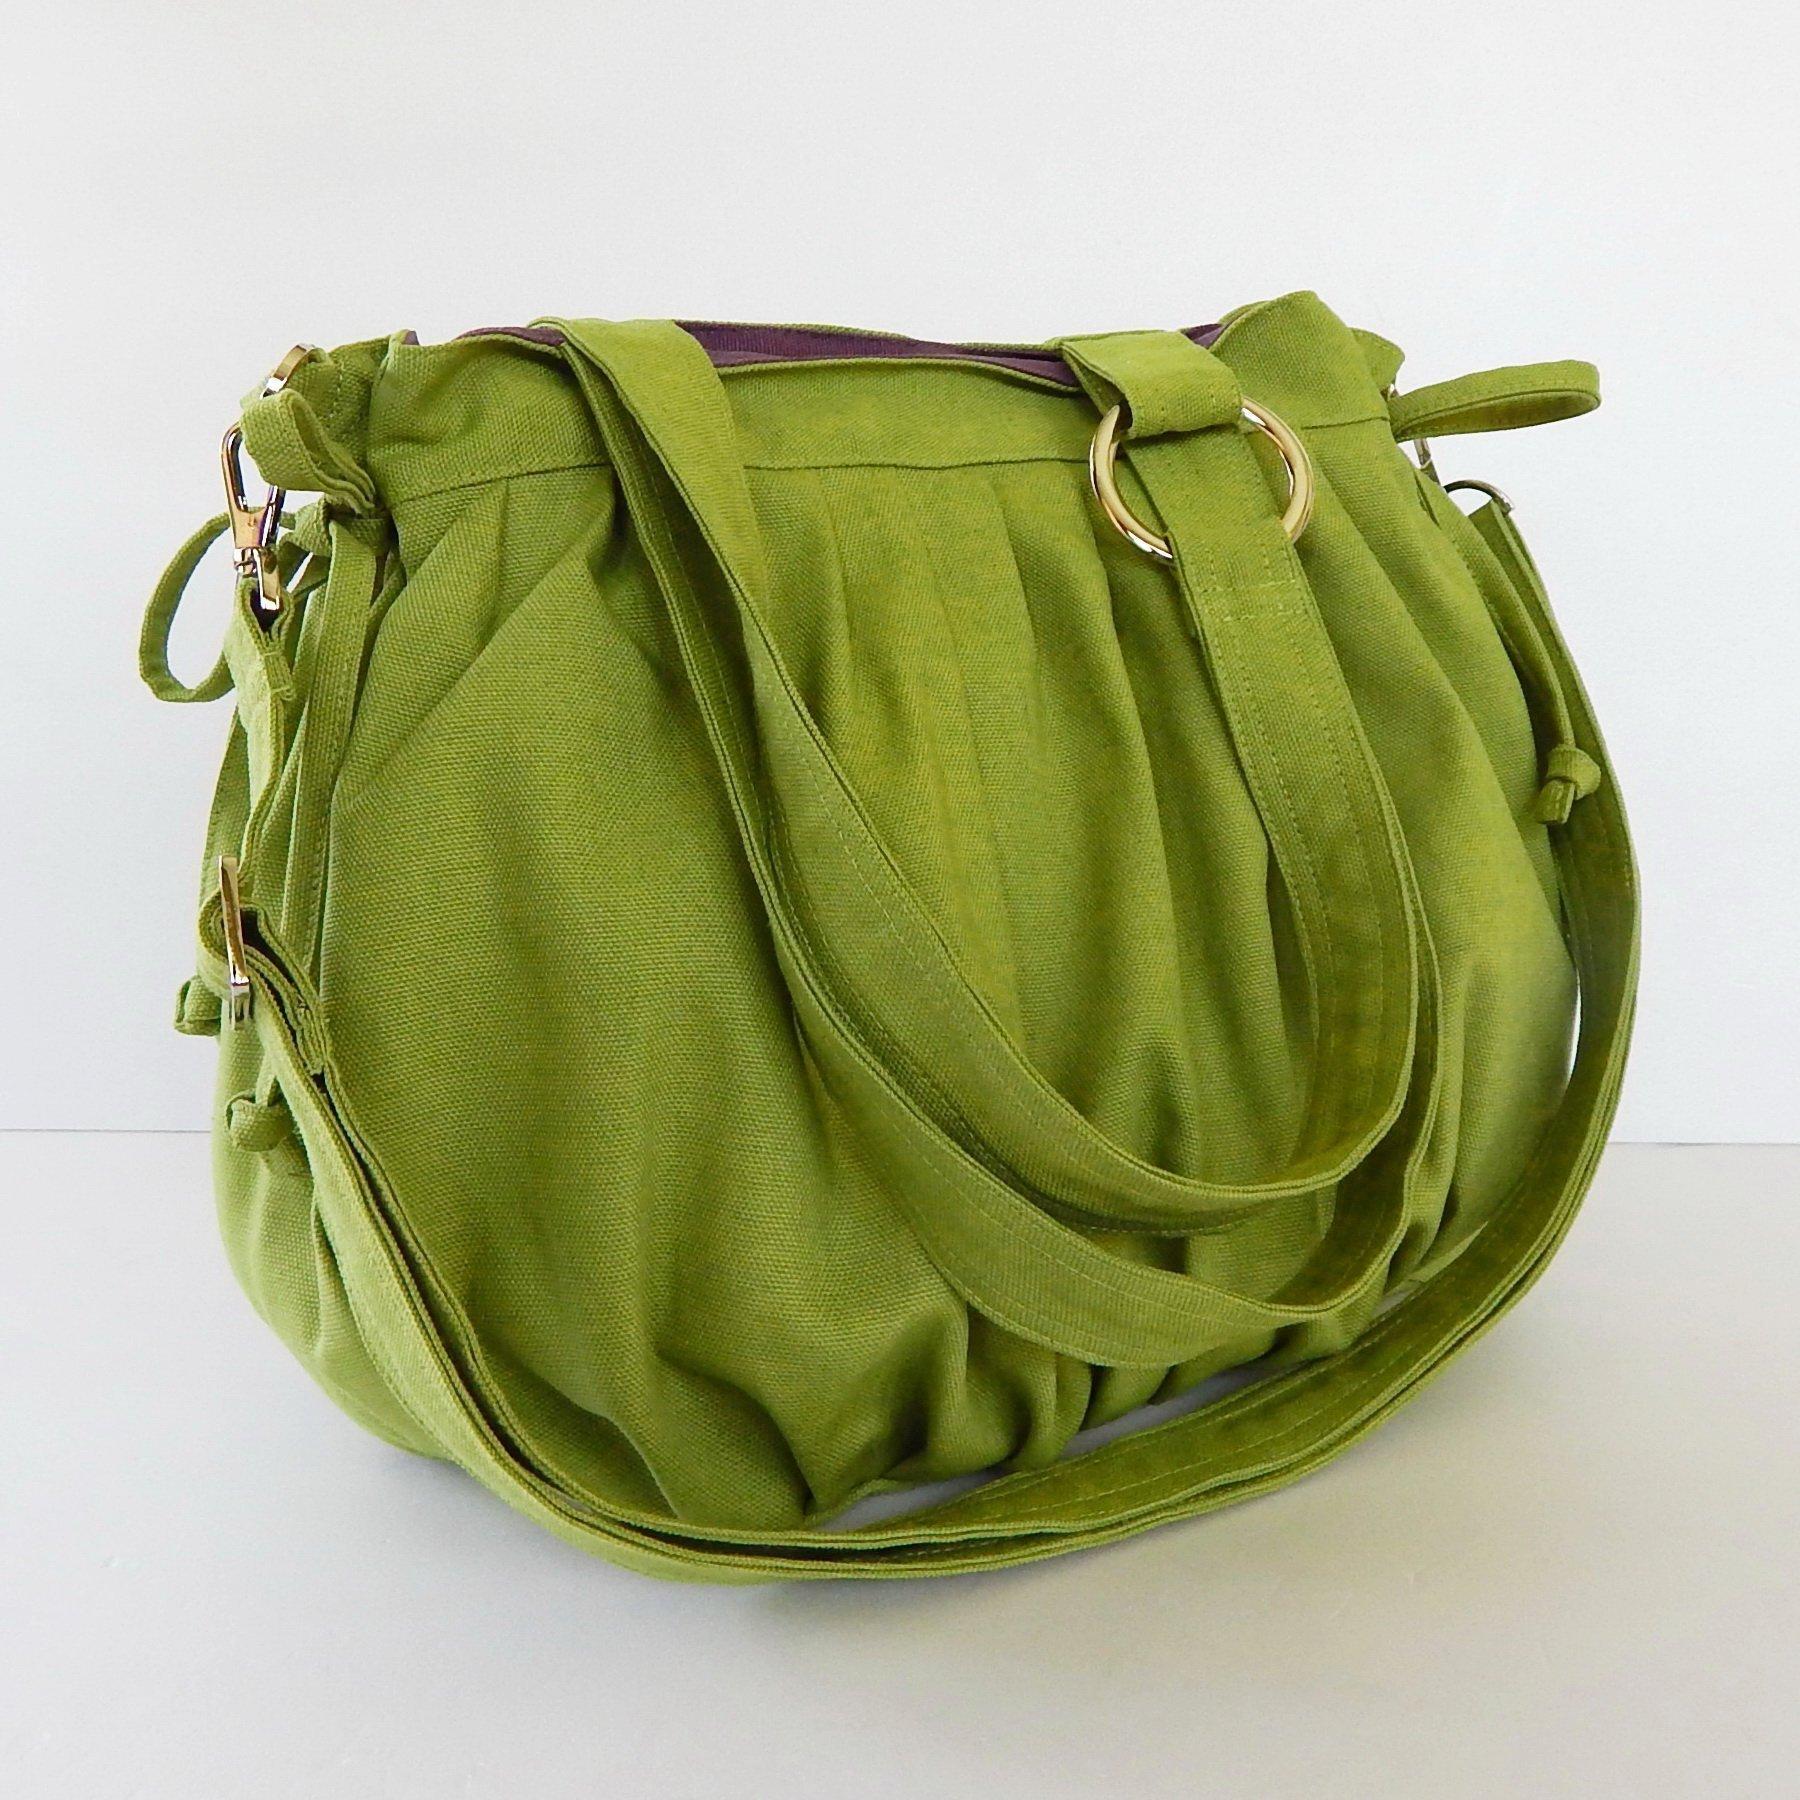 Virine canvas pleats bag, purse, tote, shoulder bag, everyday bag, travel bag, cross body, women (11''long x 11.5''tall) pear green color